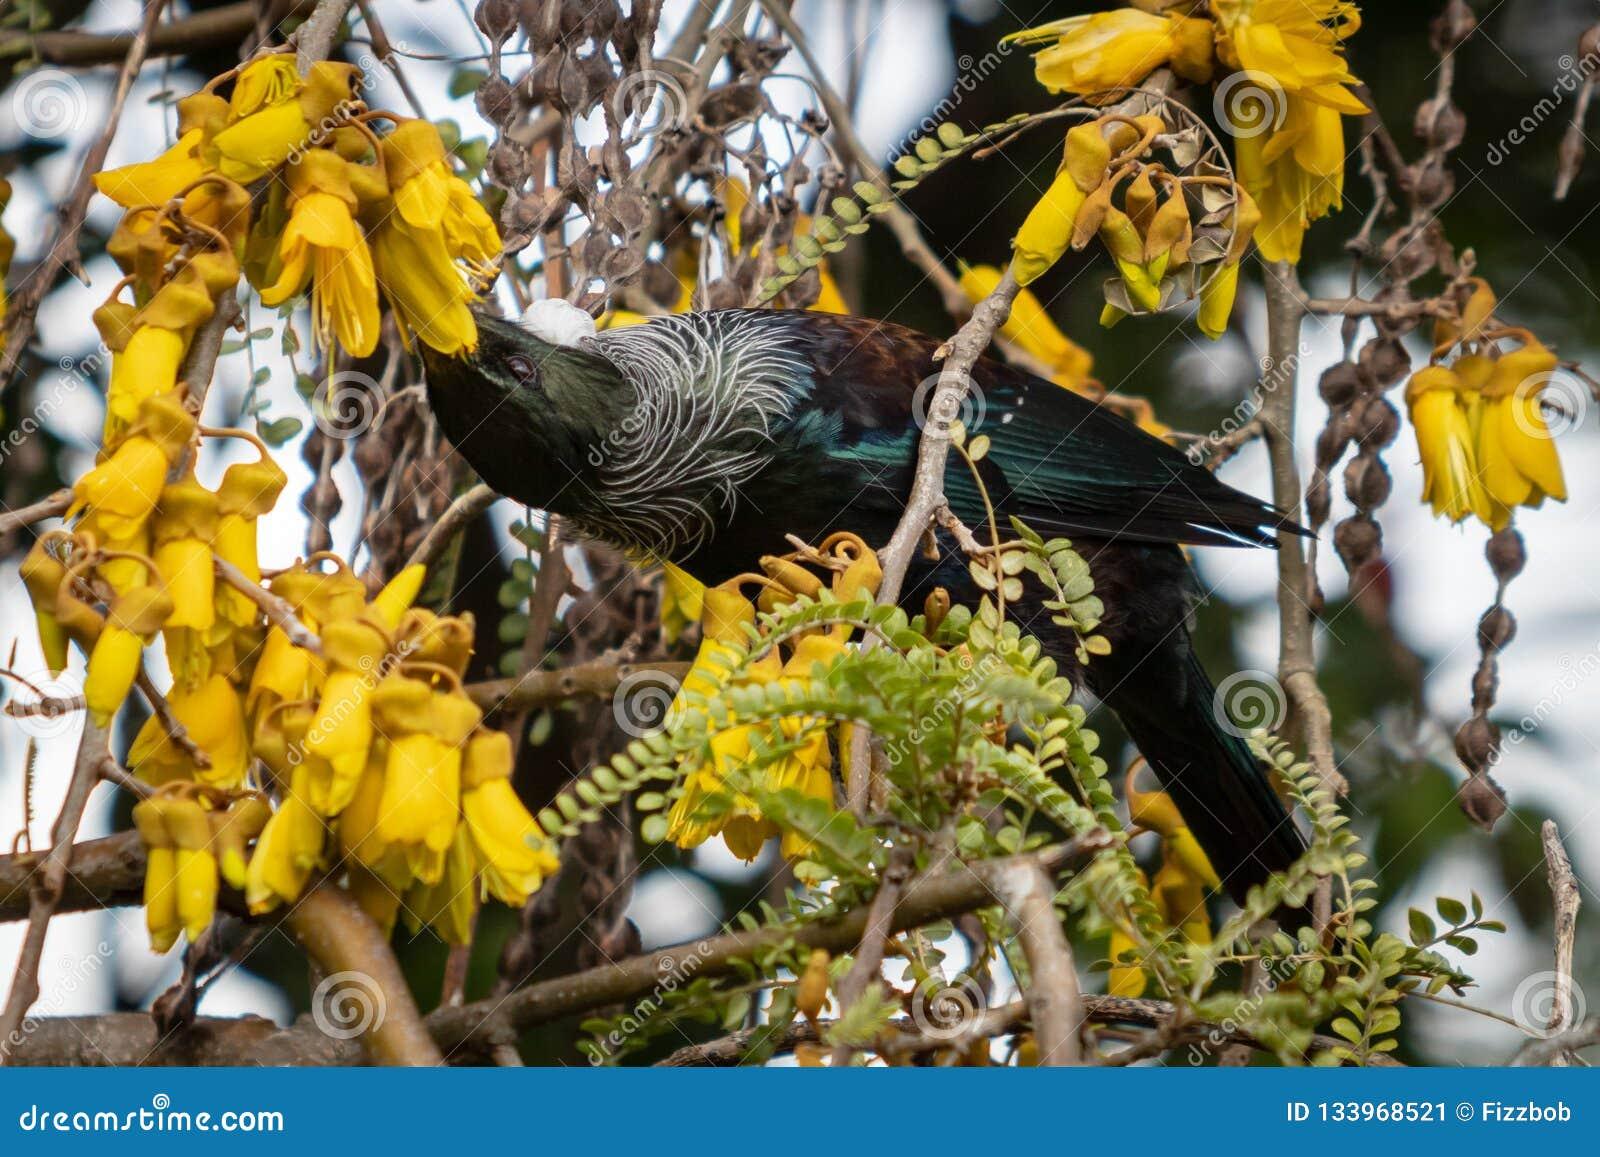 New Zealand Native Songbird The Tui In Native Kowhai Tree Sucking